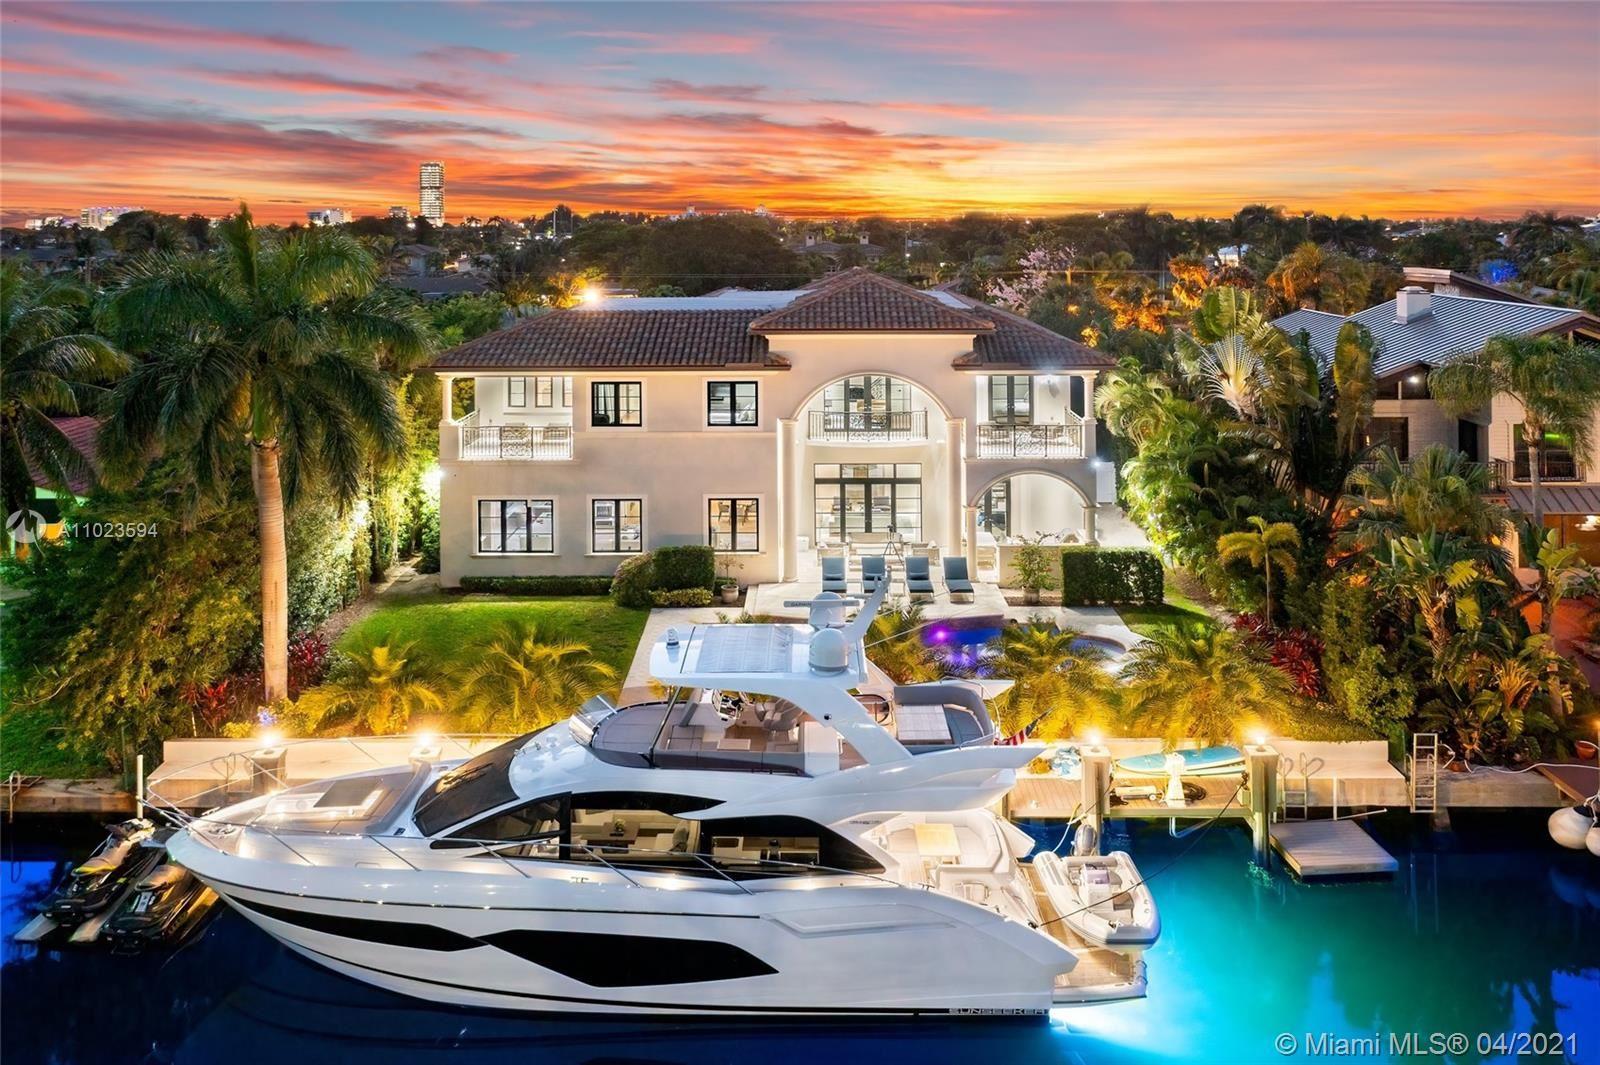 Photo of 631 Hibiscus Dr, Hallandale Beach, FL 33009 (MLS # A11023594)